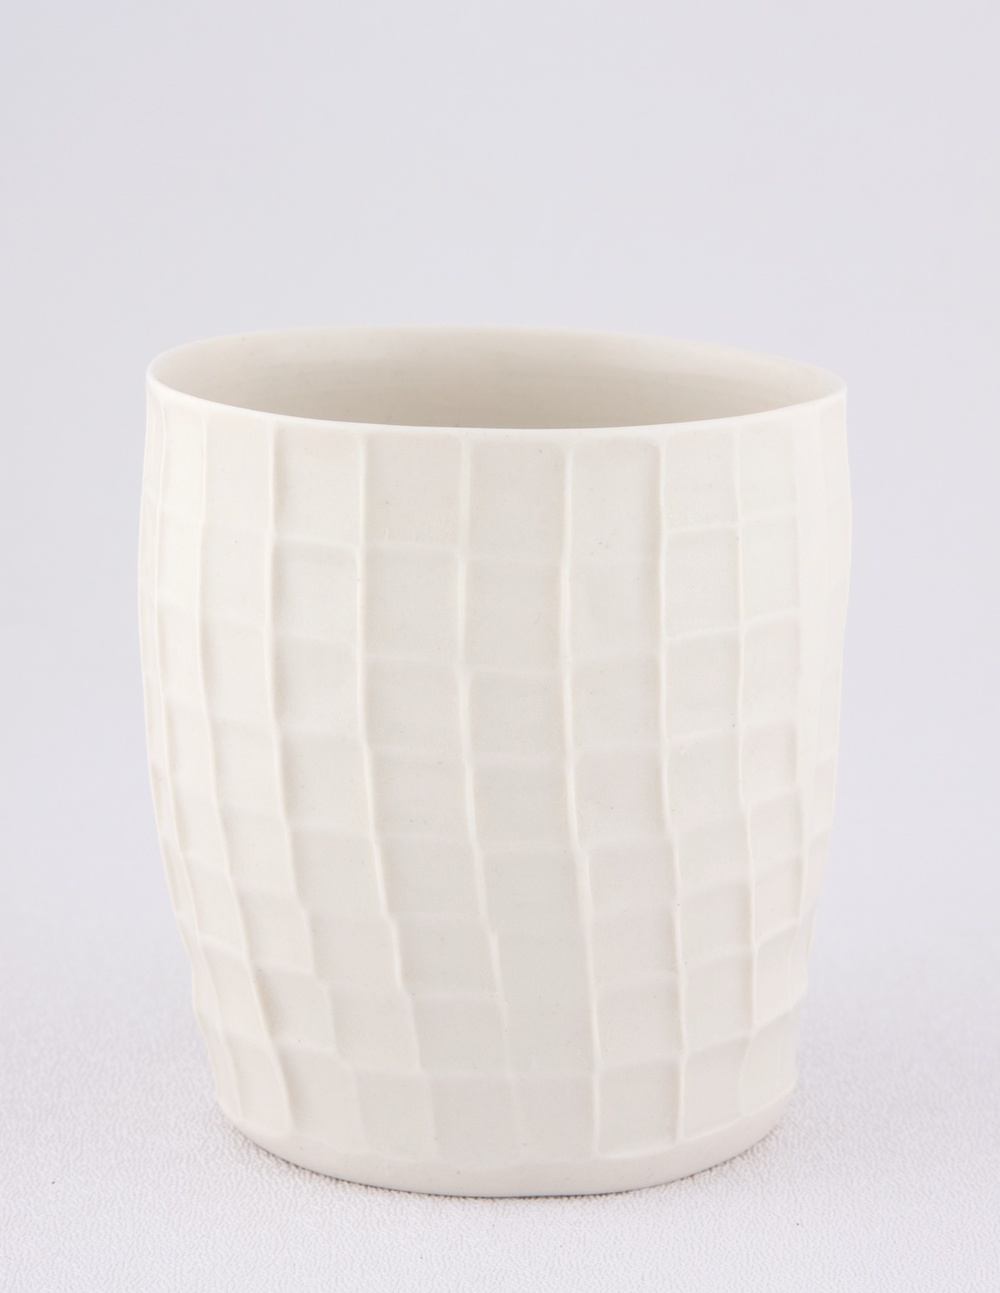 Shio Kusaka  Untitled (cup)  2009 Porcelain 3 ½h x 3w in SK018